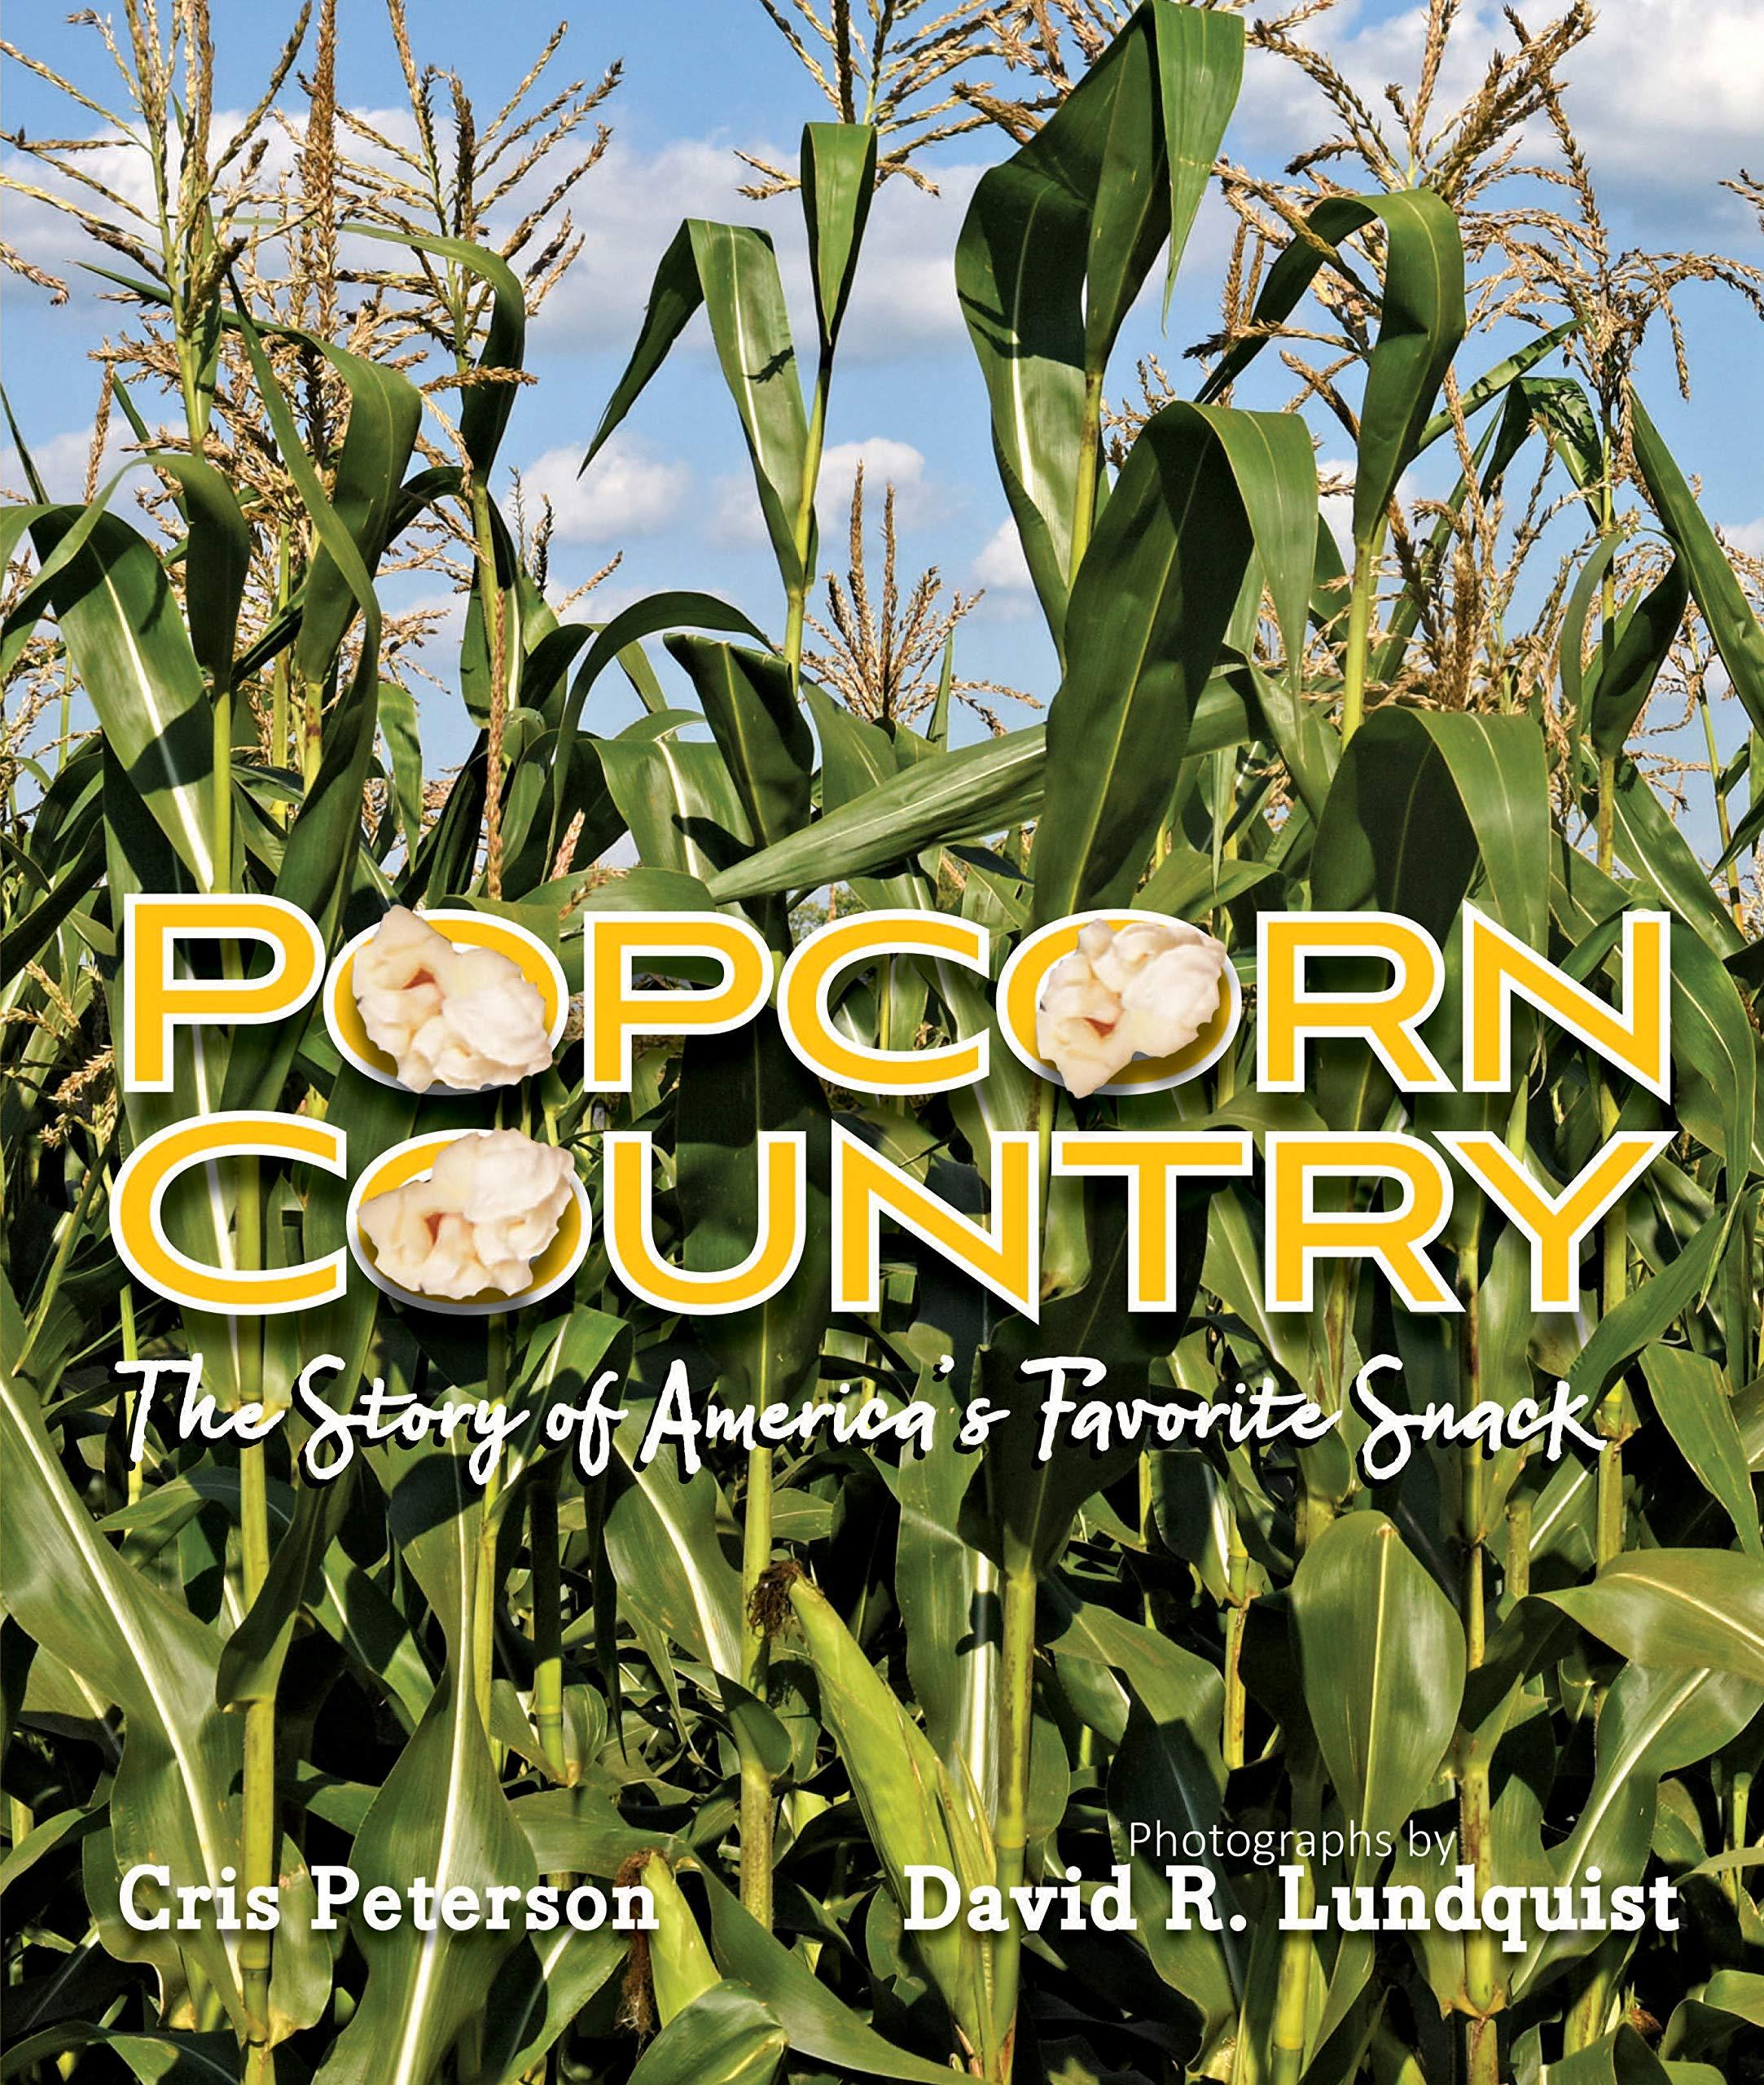 Popcorn Country: The Story of America's Favorite Snack: Peterson, Cris,  Lundquist, David R.: 9781629798929: Amazon.com: Books